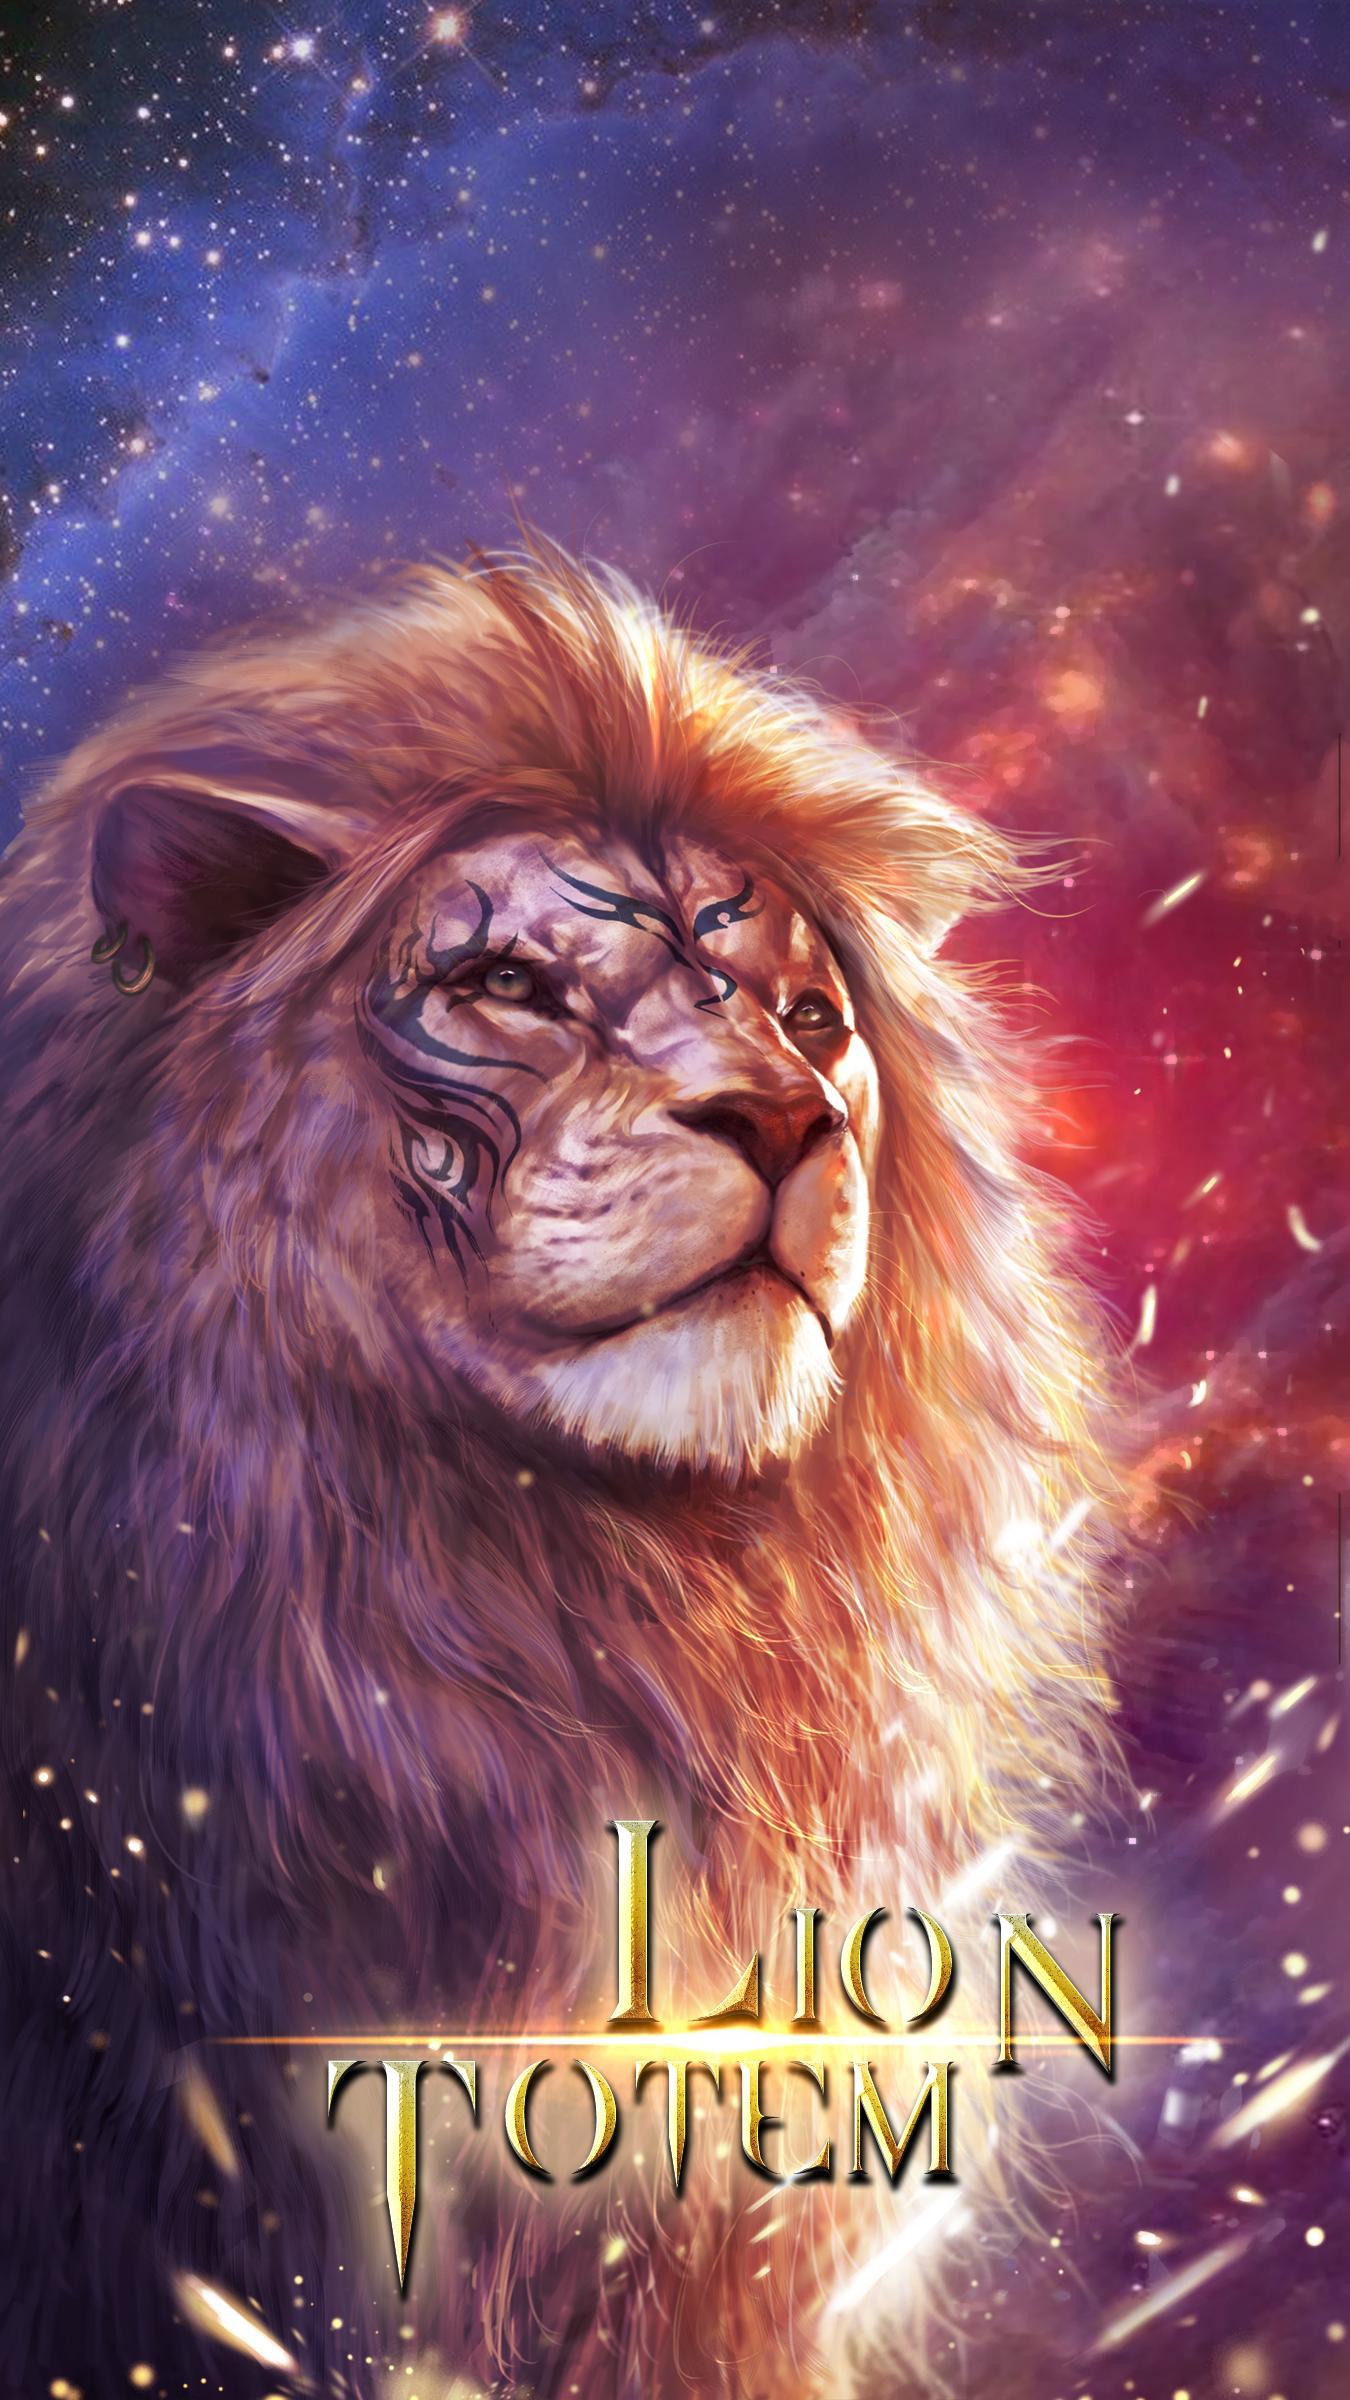 Lion Totem Live Wallpaper For Android APK Download